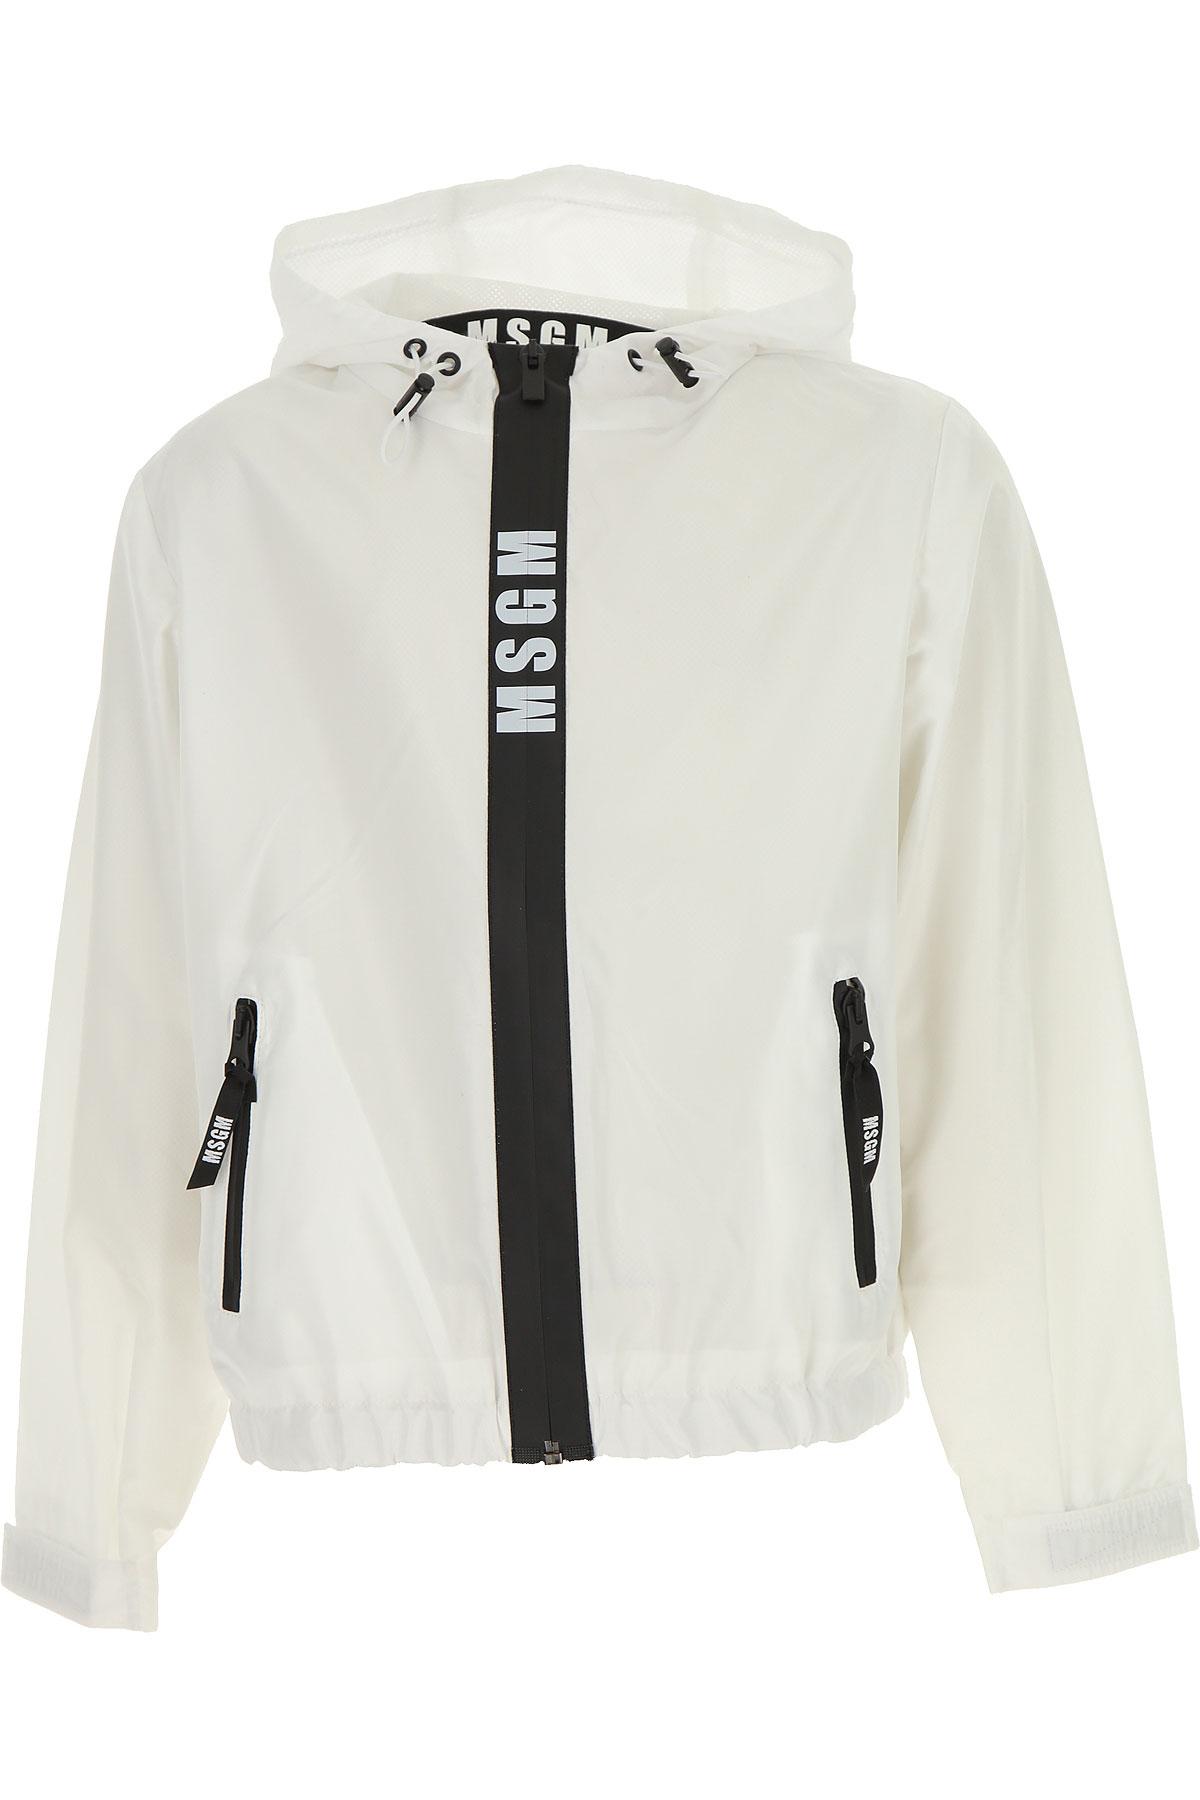 MSGM Kids Jacket for Boys, White, polyester, 2017, 10Y 14Y 8Y